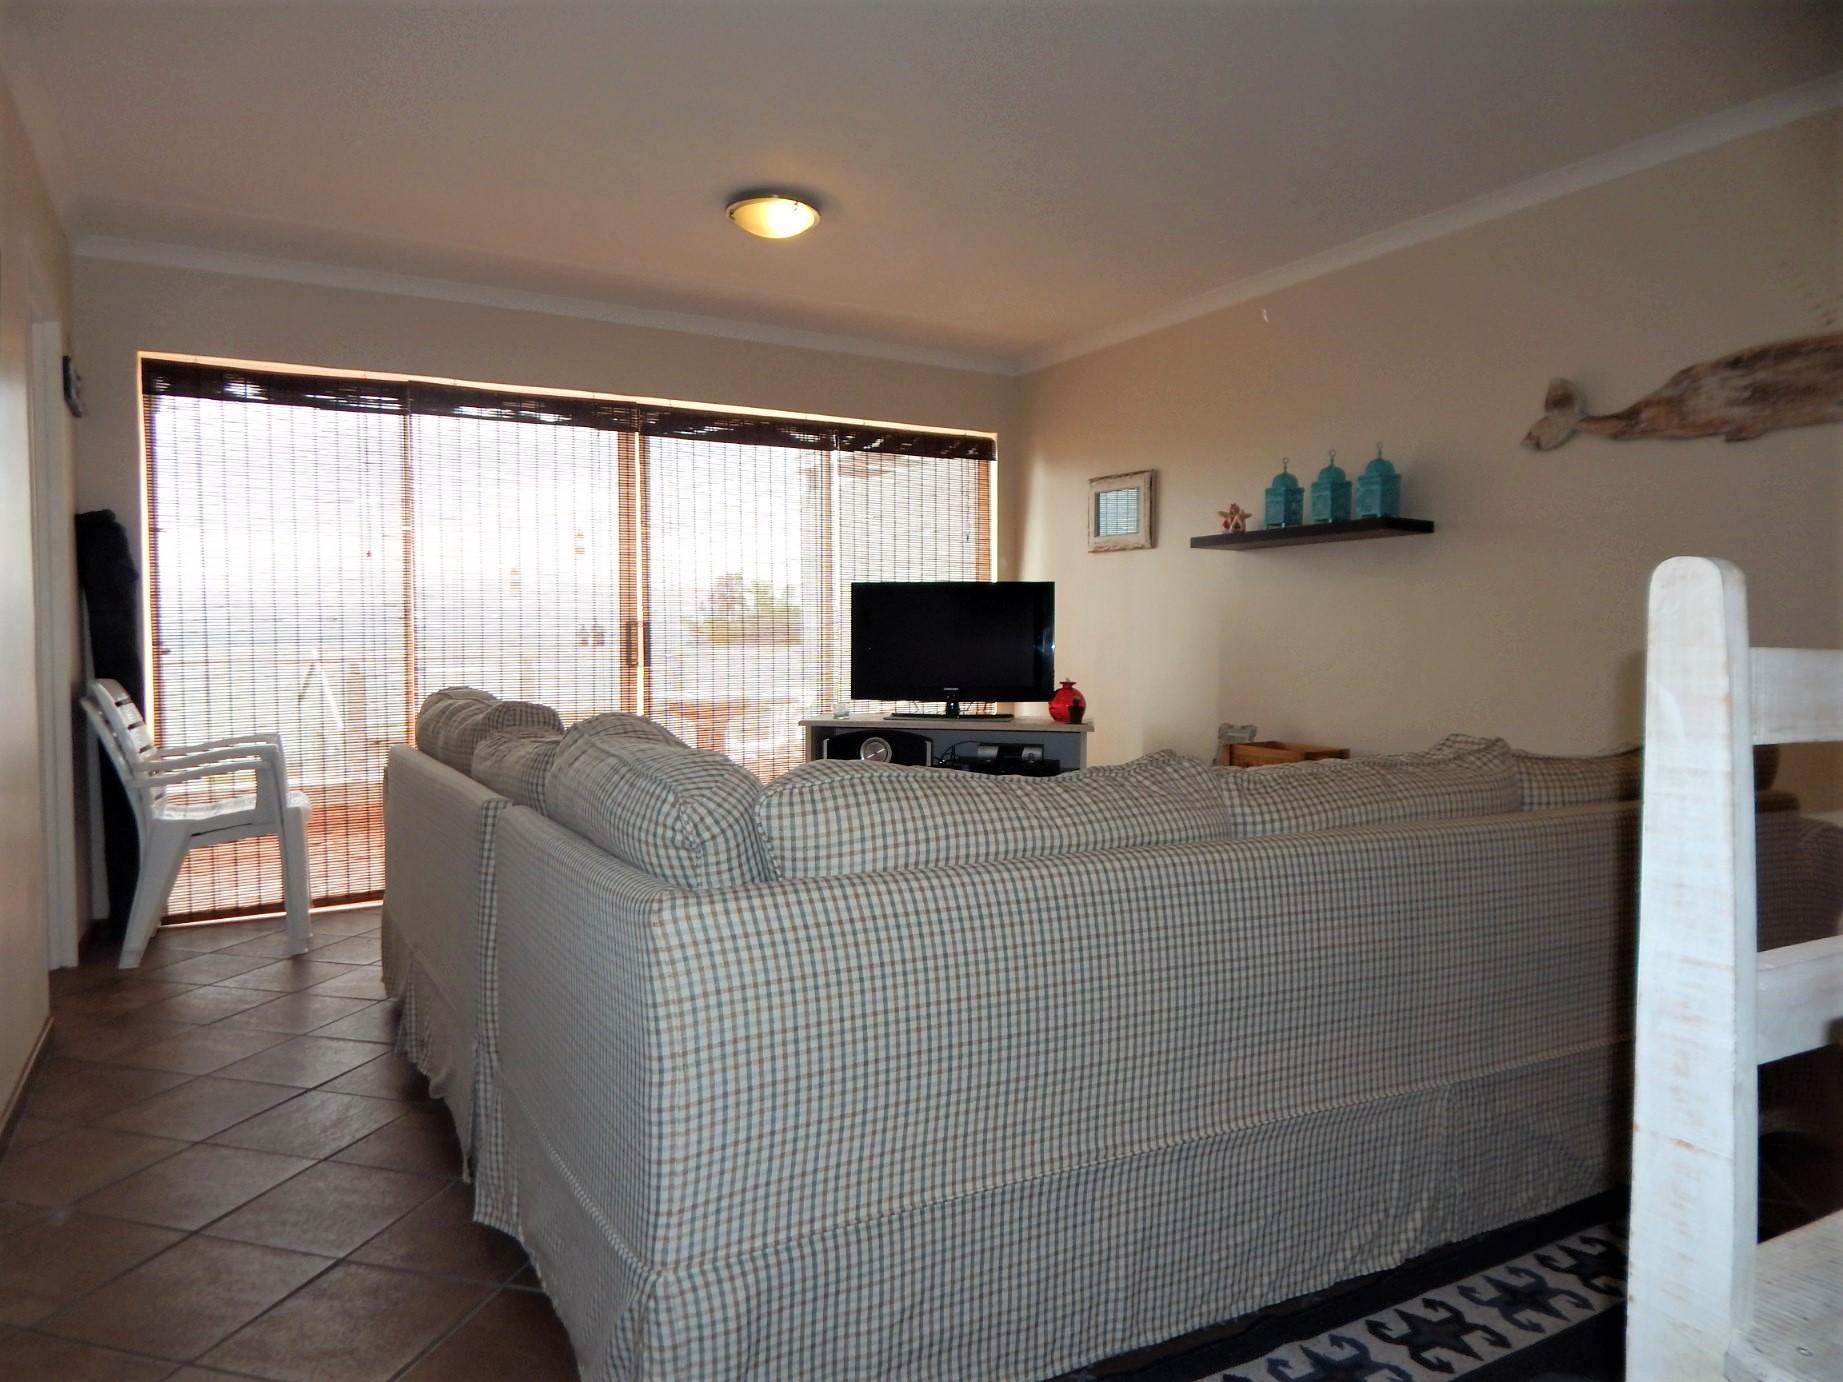 3 Bedroom Apartment for sale in De Bakke ENT0066483 : photo#13